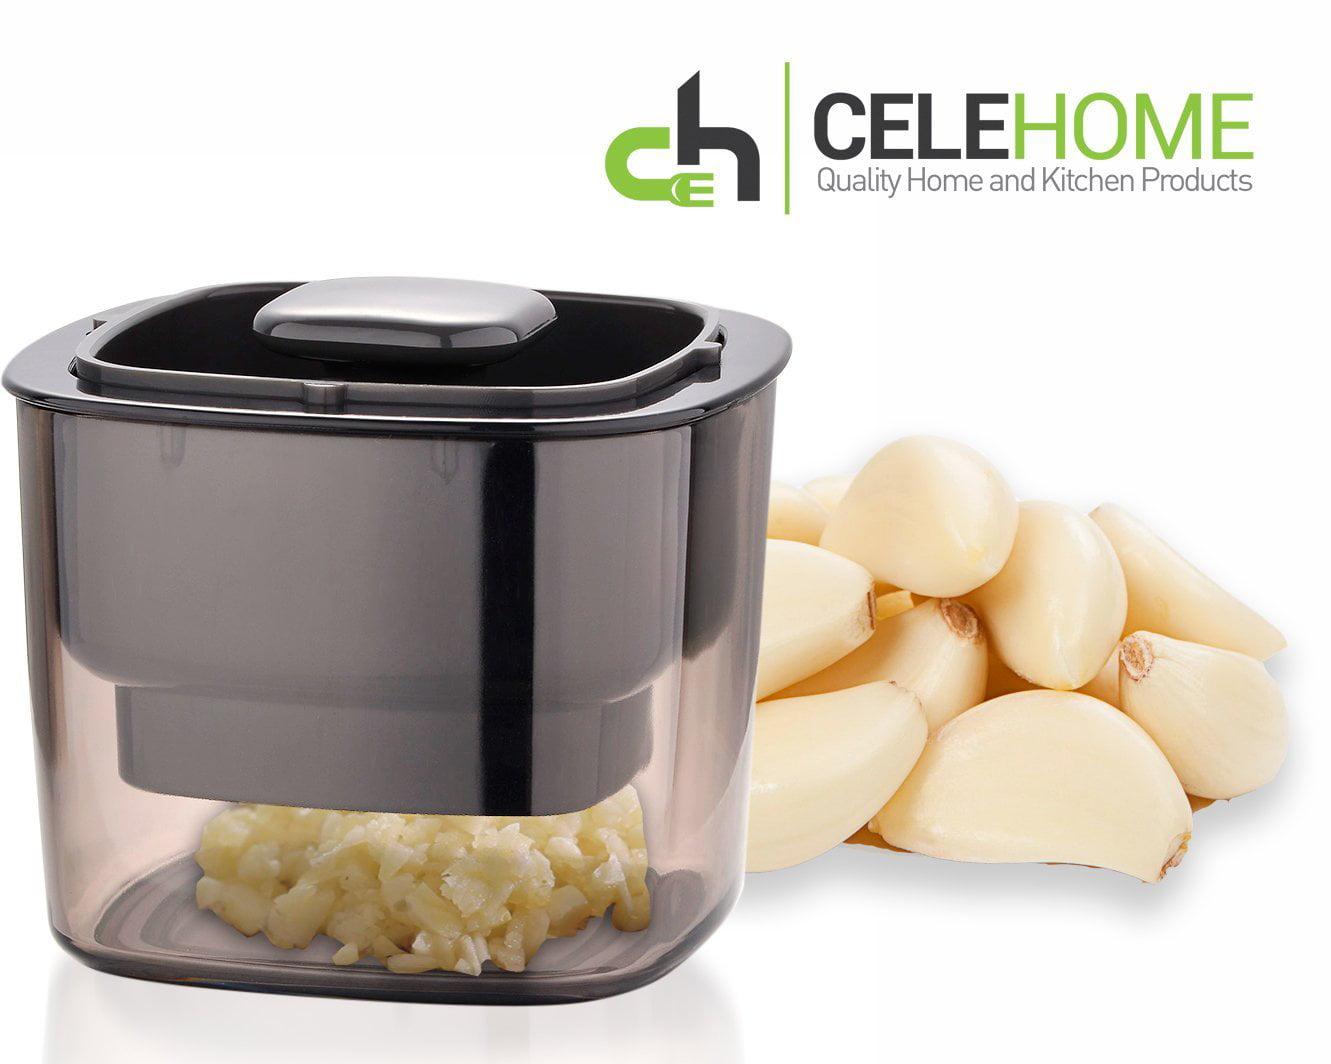 Garlic Press Dicer and Slicer by